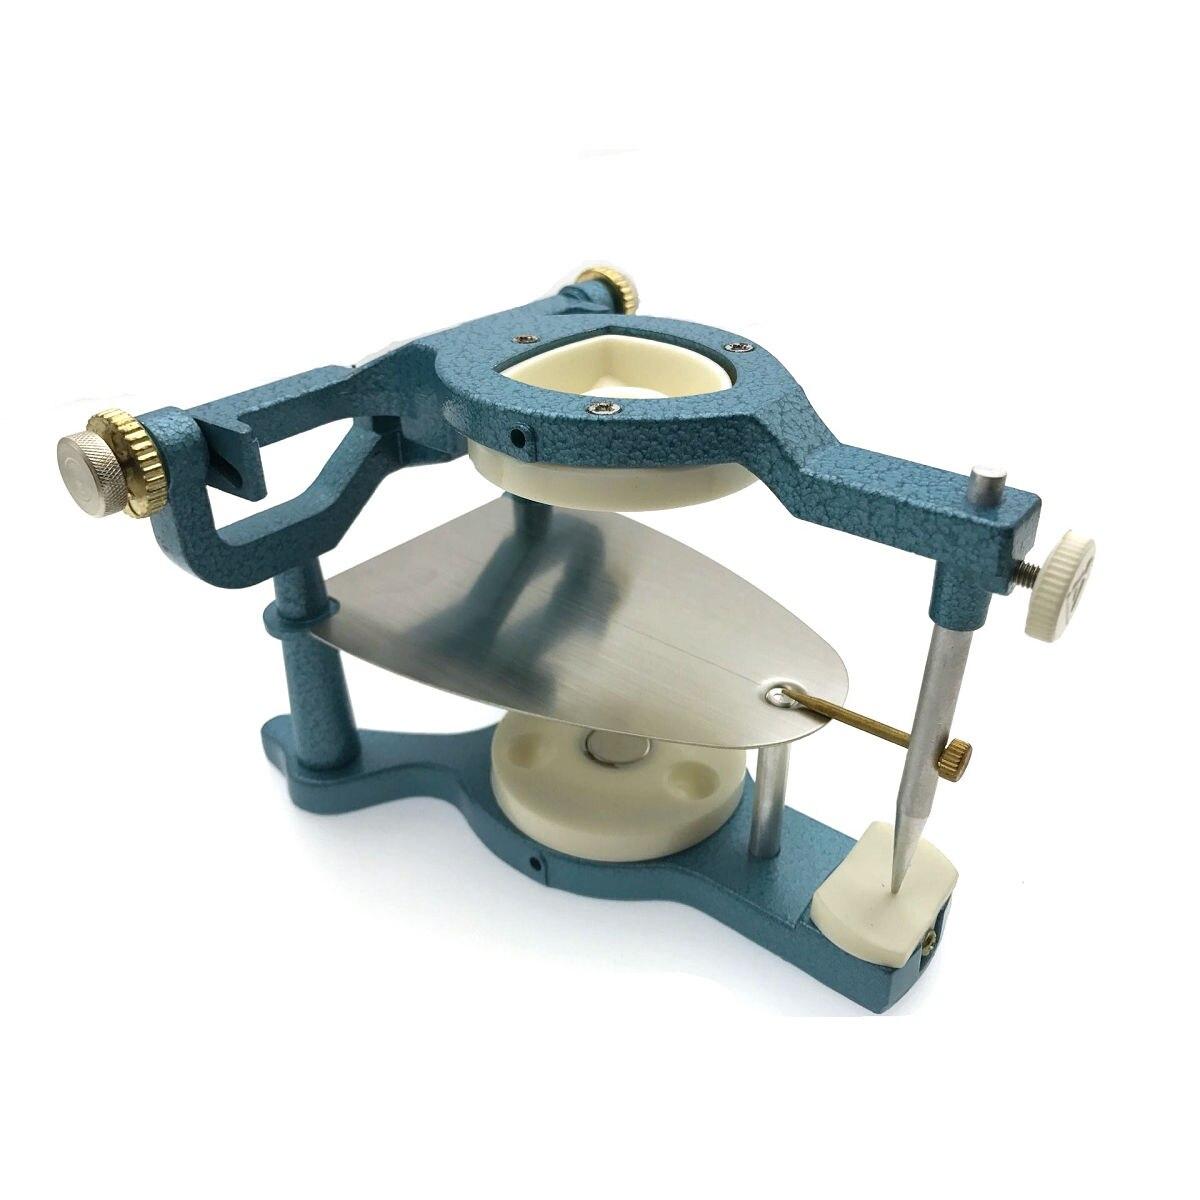 High Quality Dental Laboratory Equipment Big Size Silvery Alloy Articulators Adjustable Denture Magnetic Anatomic Articulator